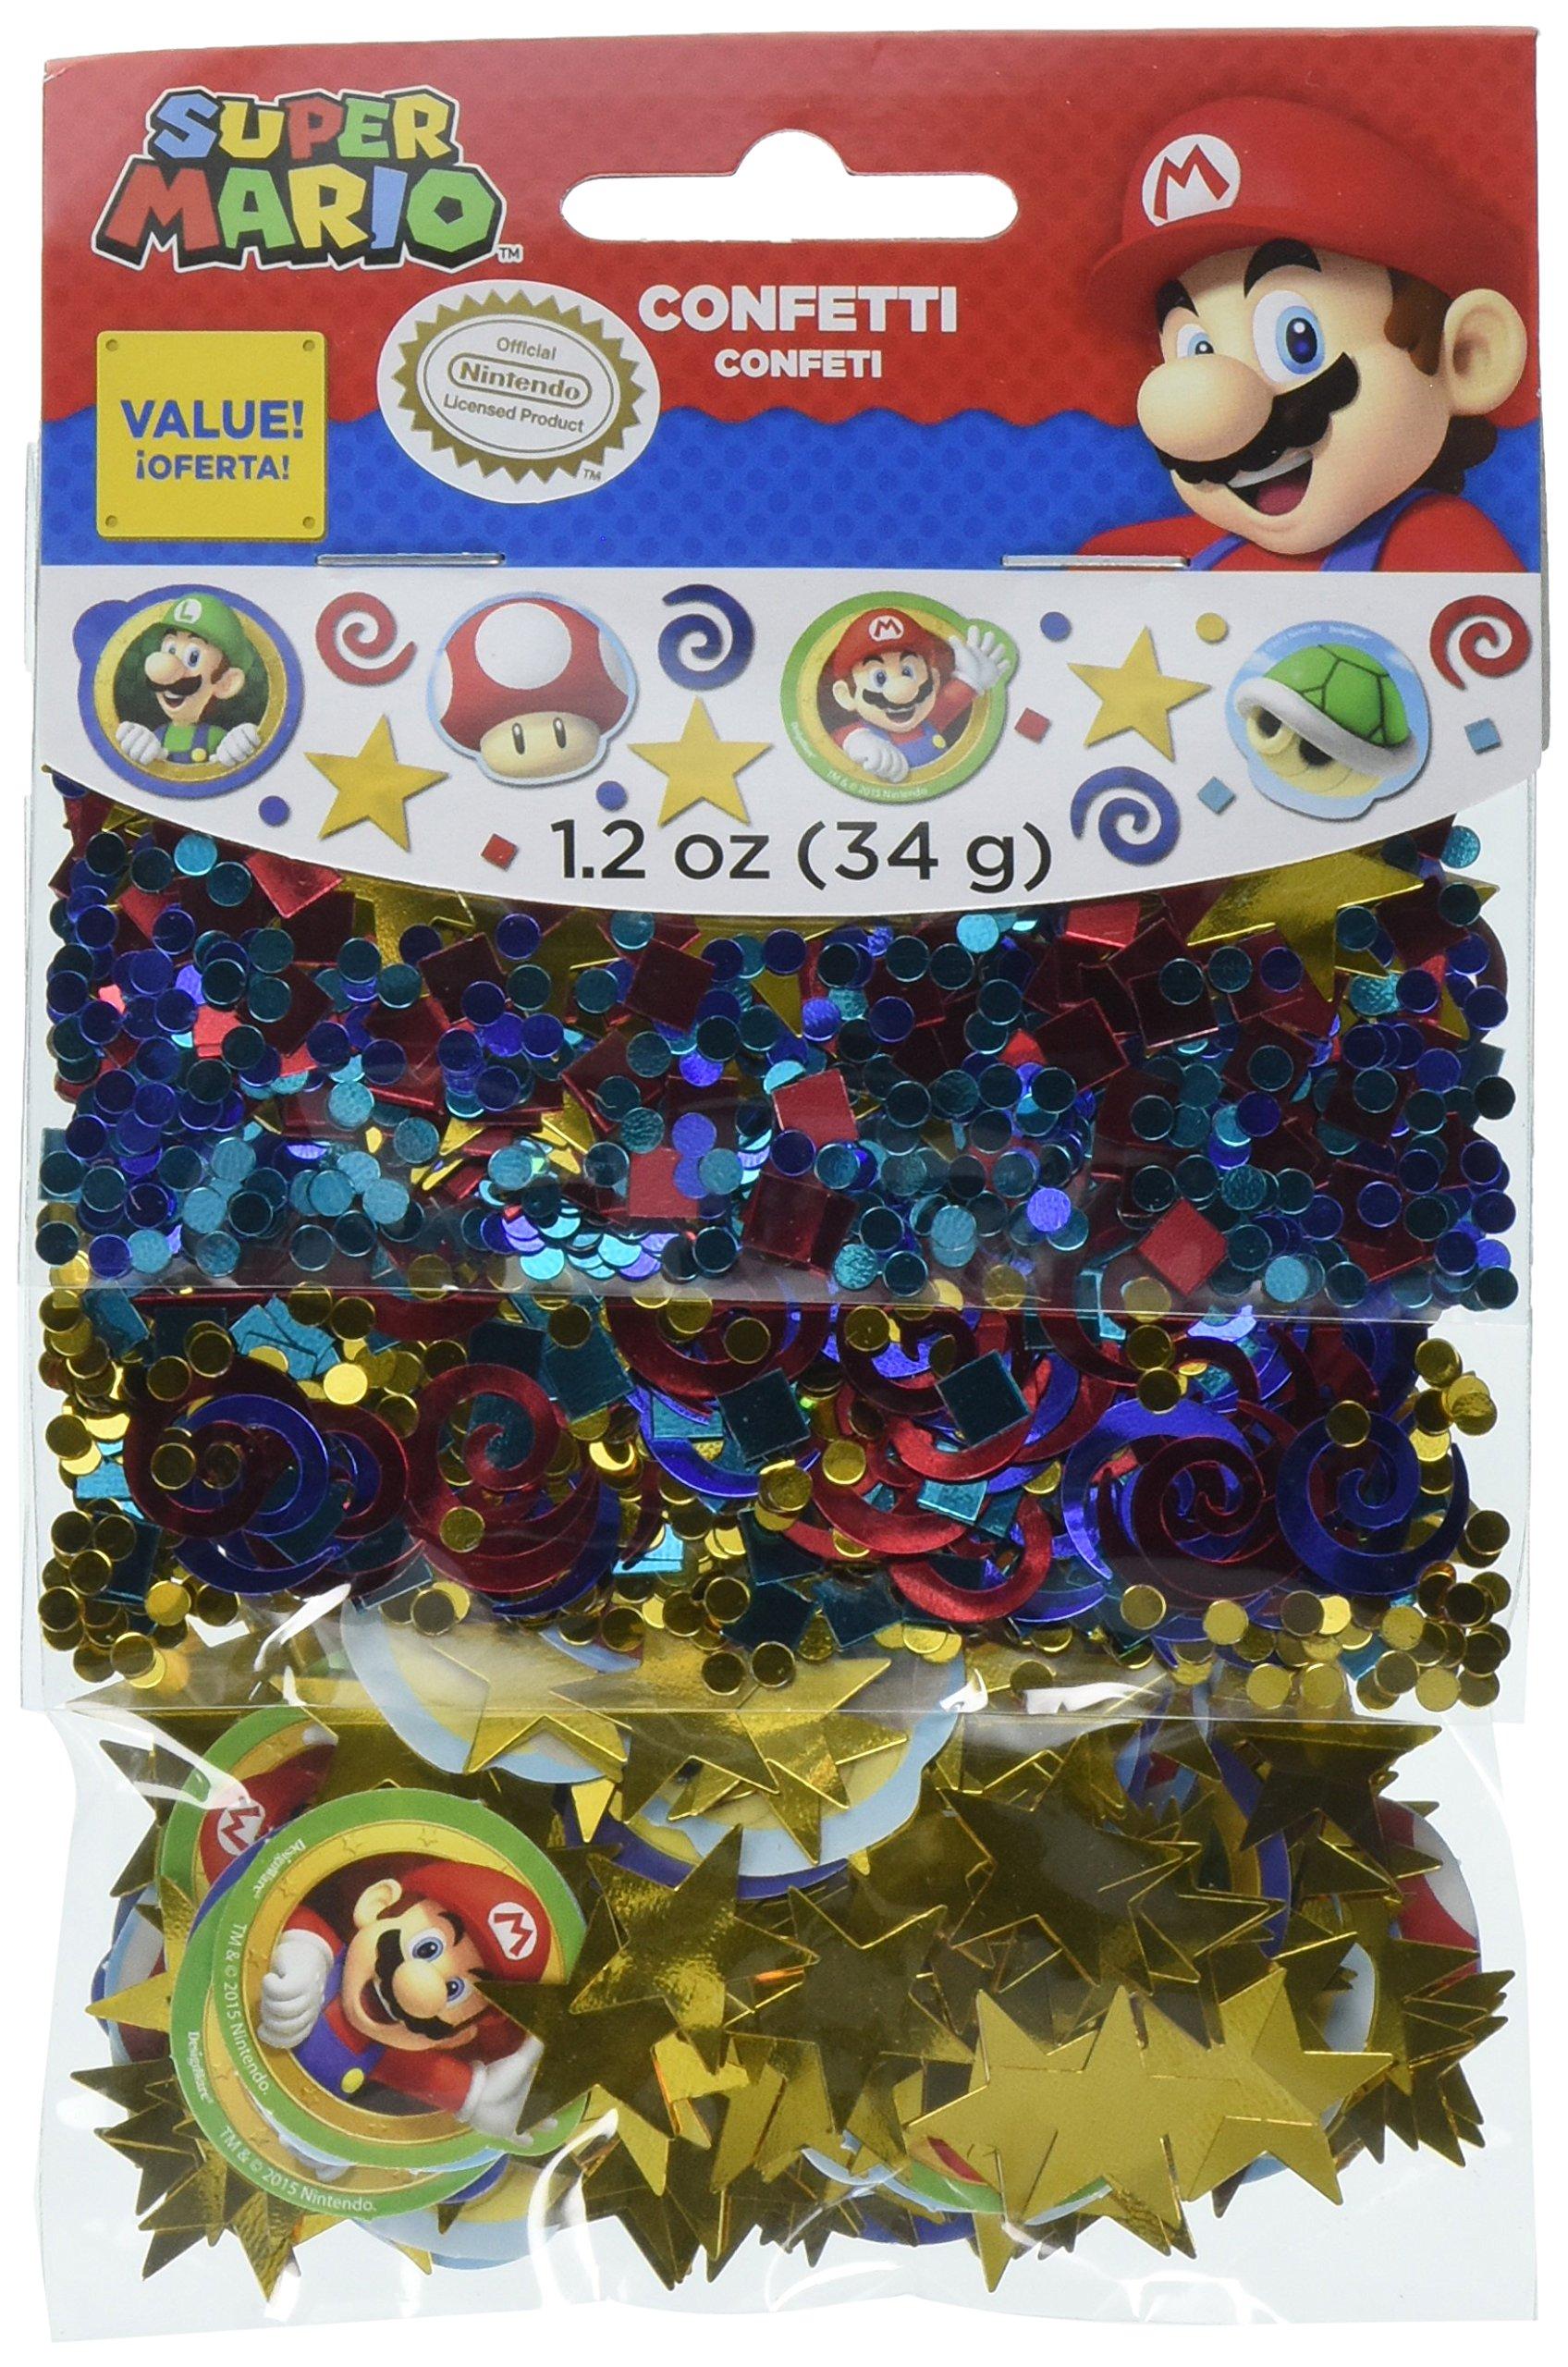 amscan Super Mario Brothers Value Confetti, Party Favor, 12 Ct.